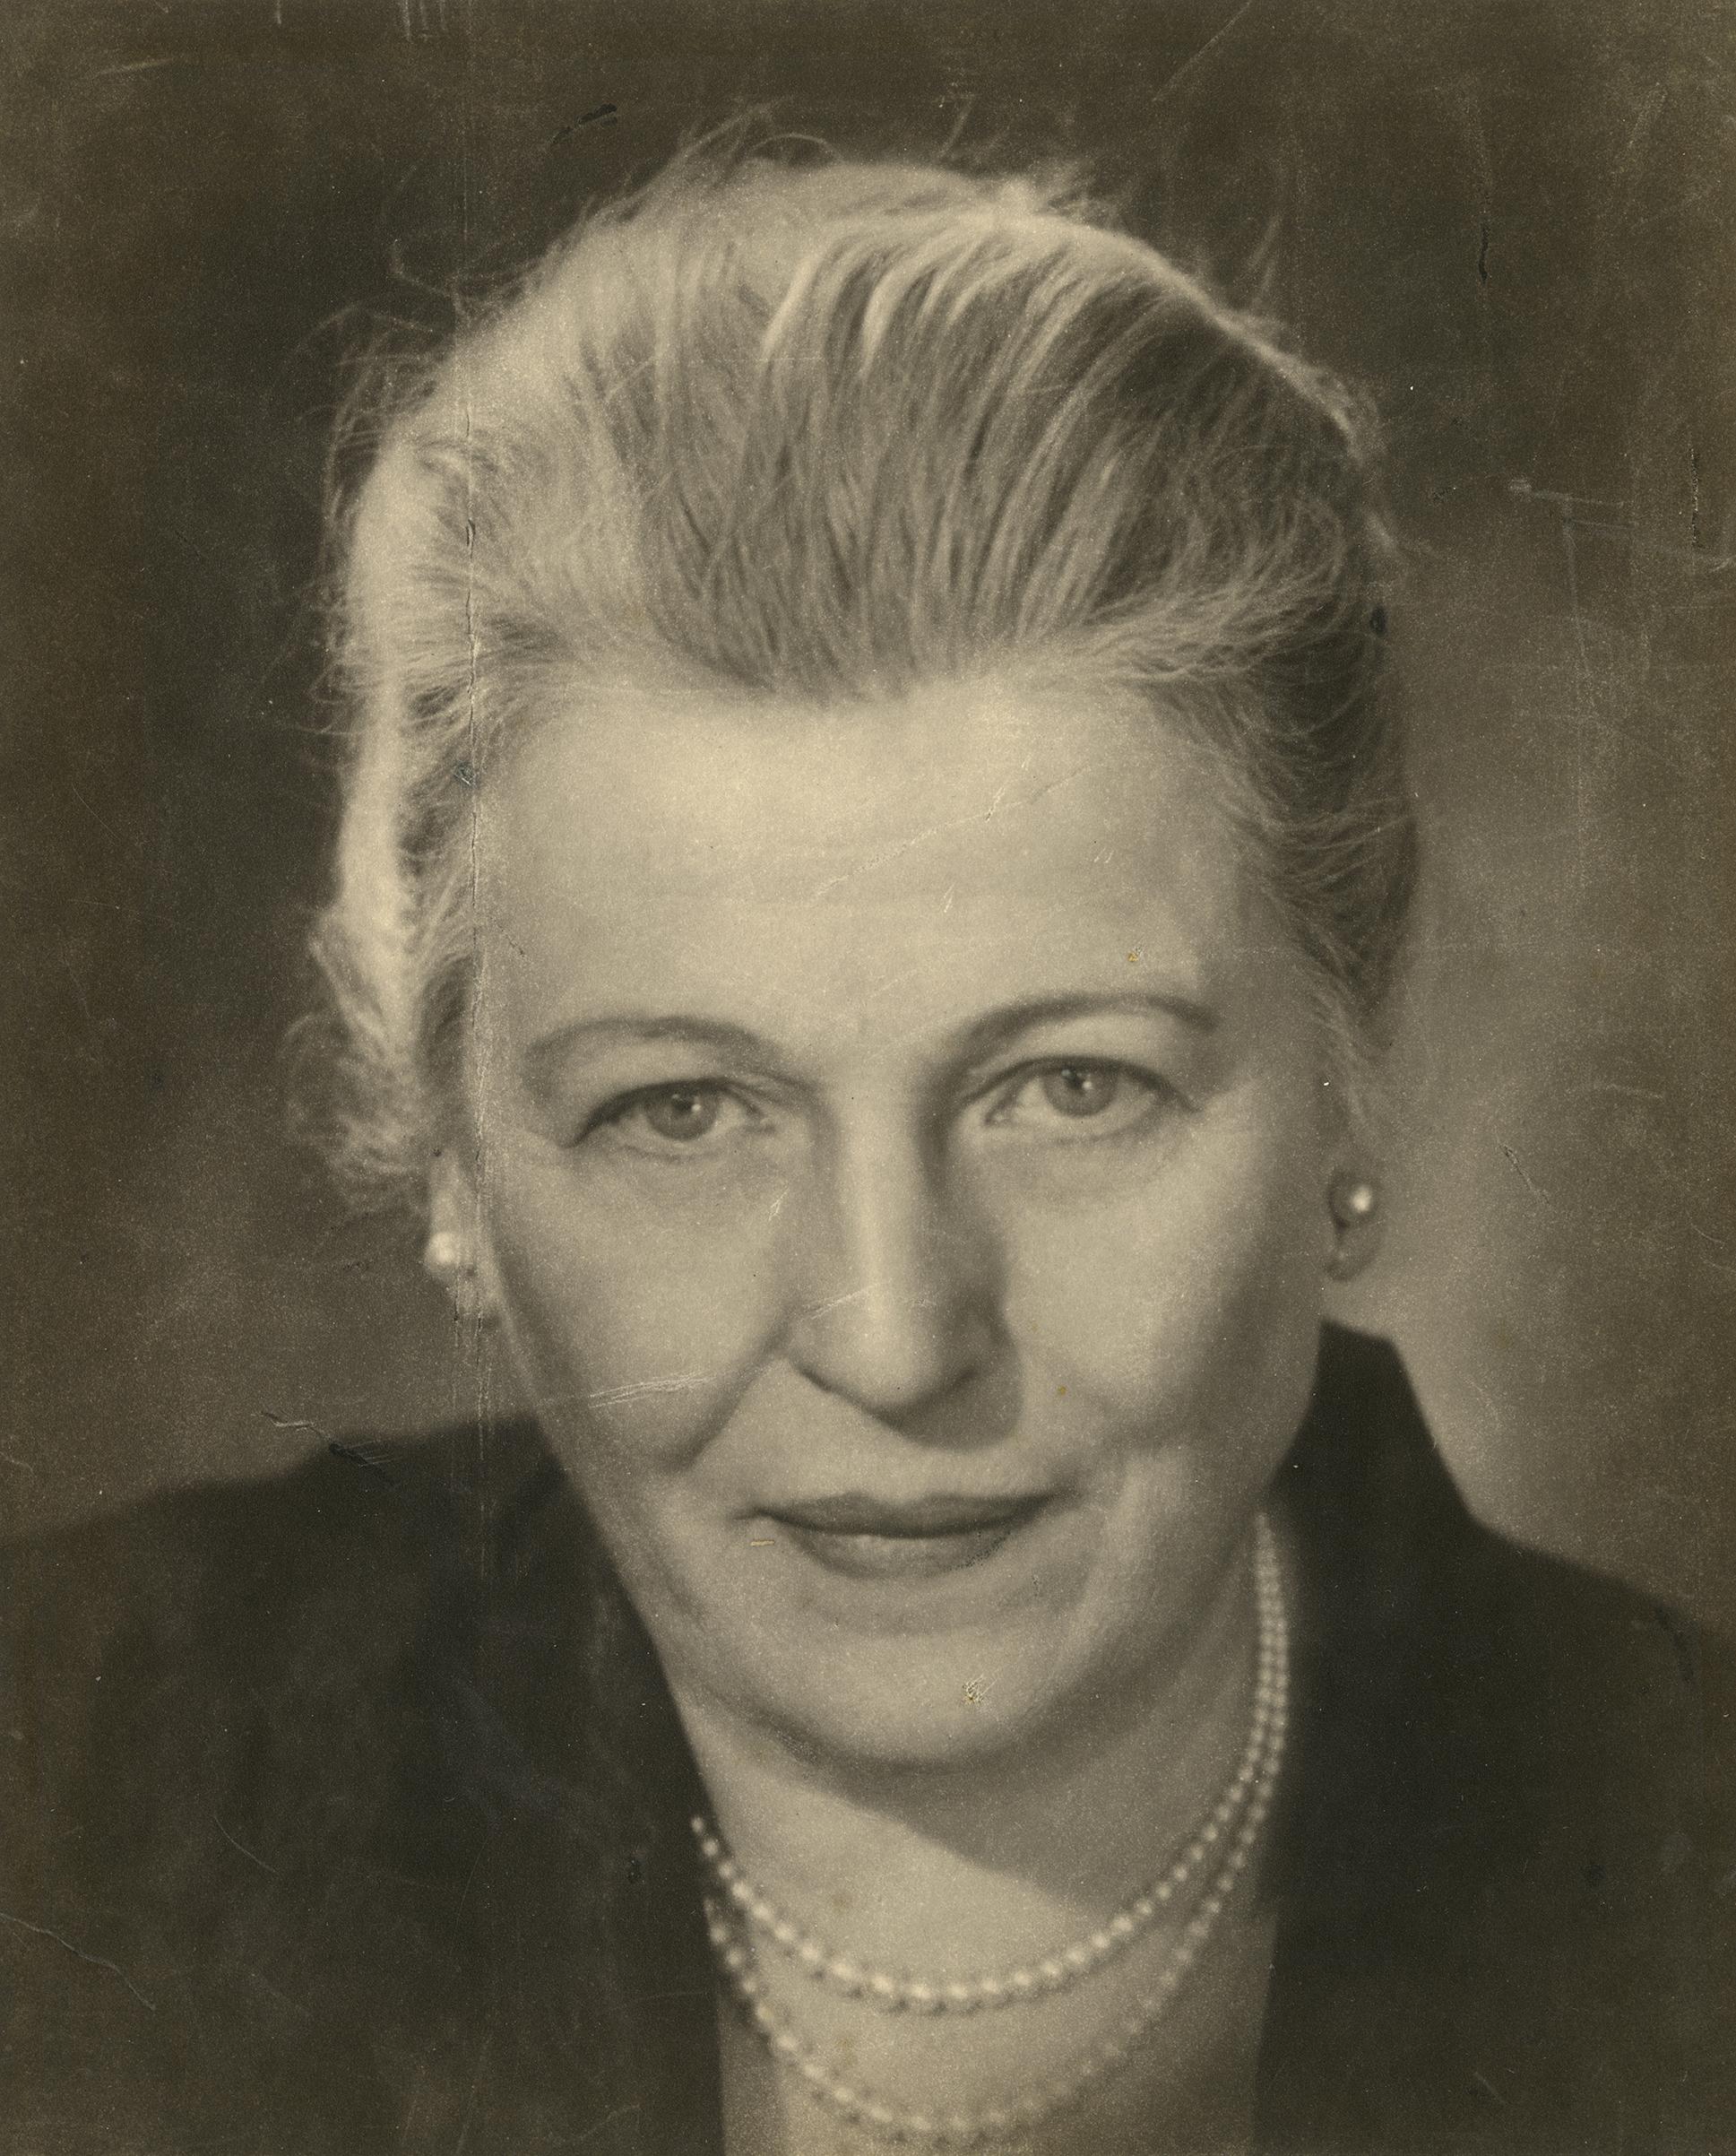 Pearl Buck, 1955. Gelatin silver print. New-York Historical Society, Gift of Kenneth Sherman.